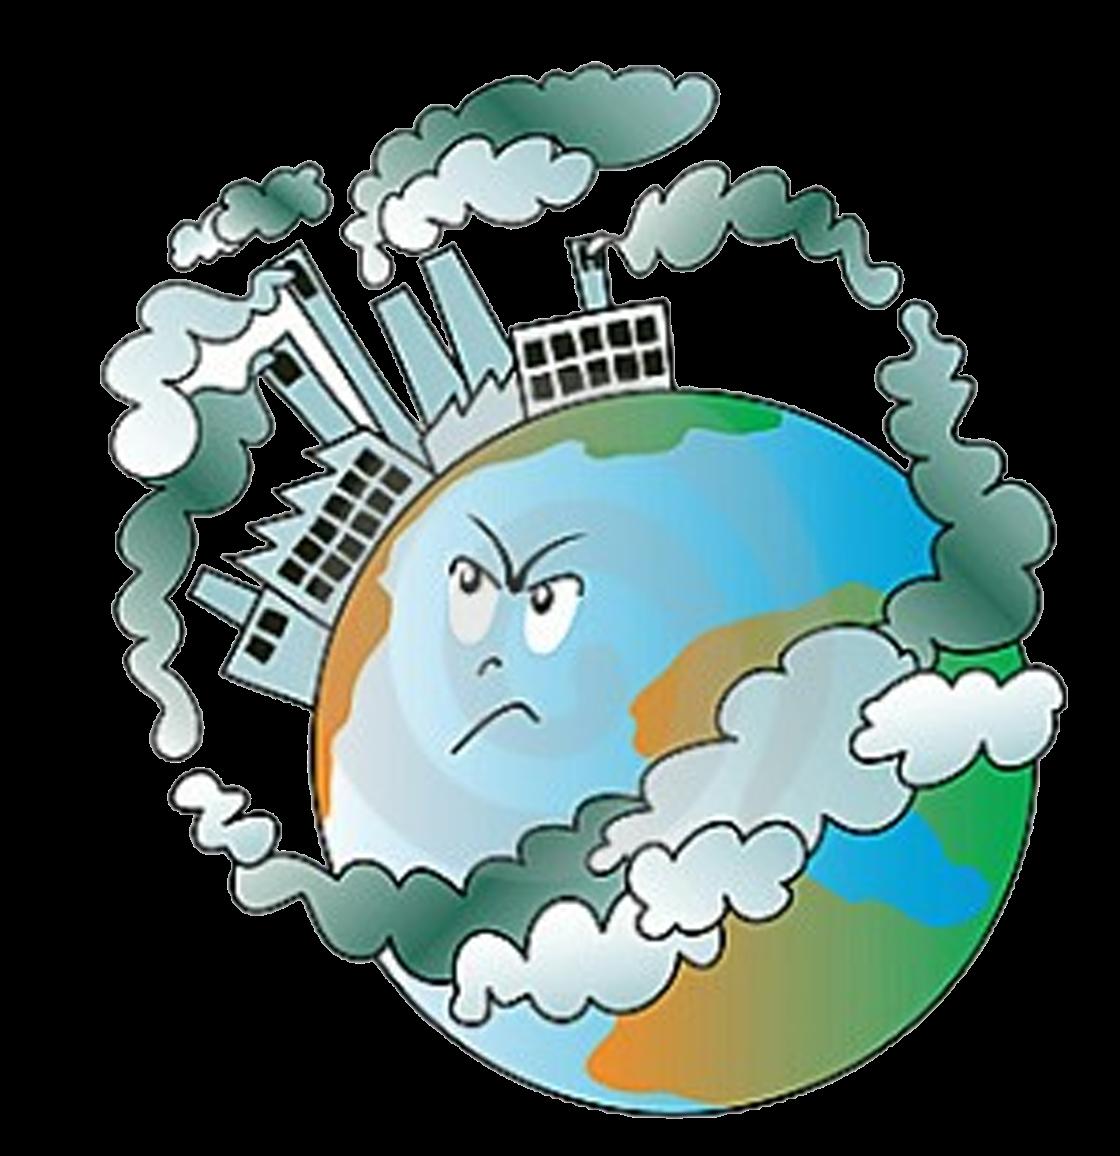 Environment clipart pollution free environment. Air soil contamination water